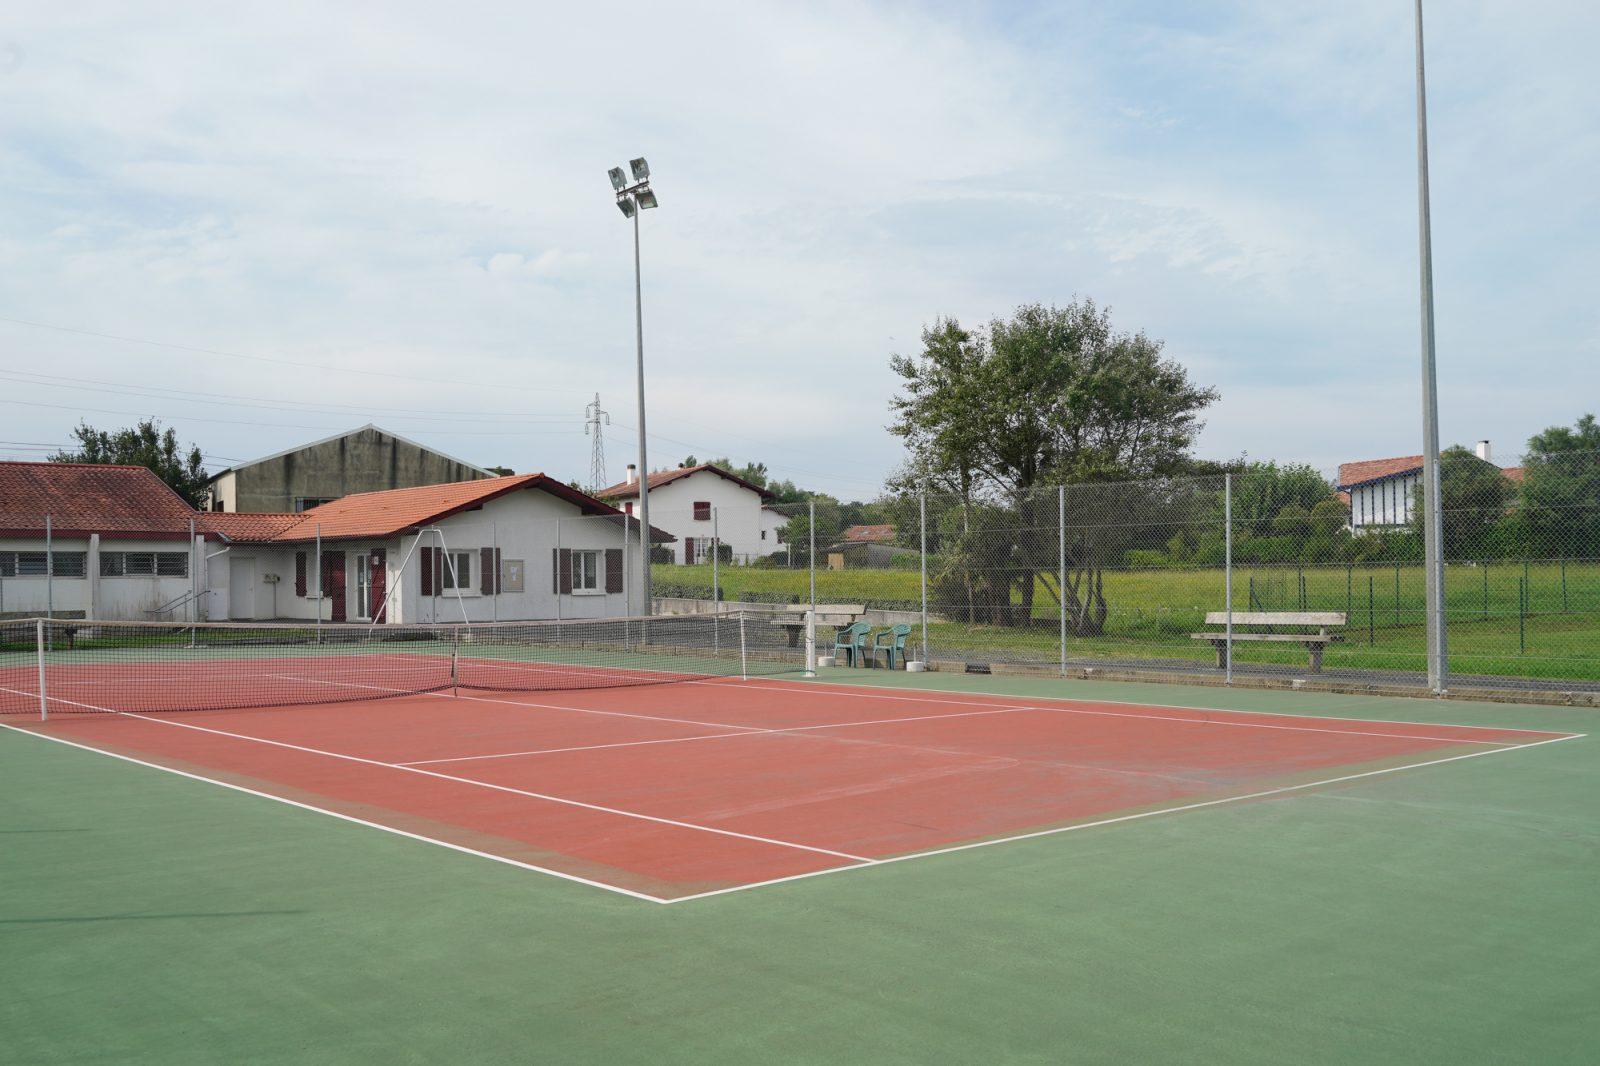 Tournoi de tennis Angèle